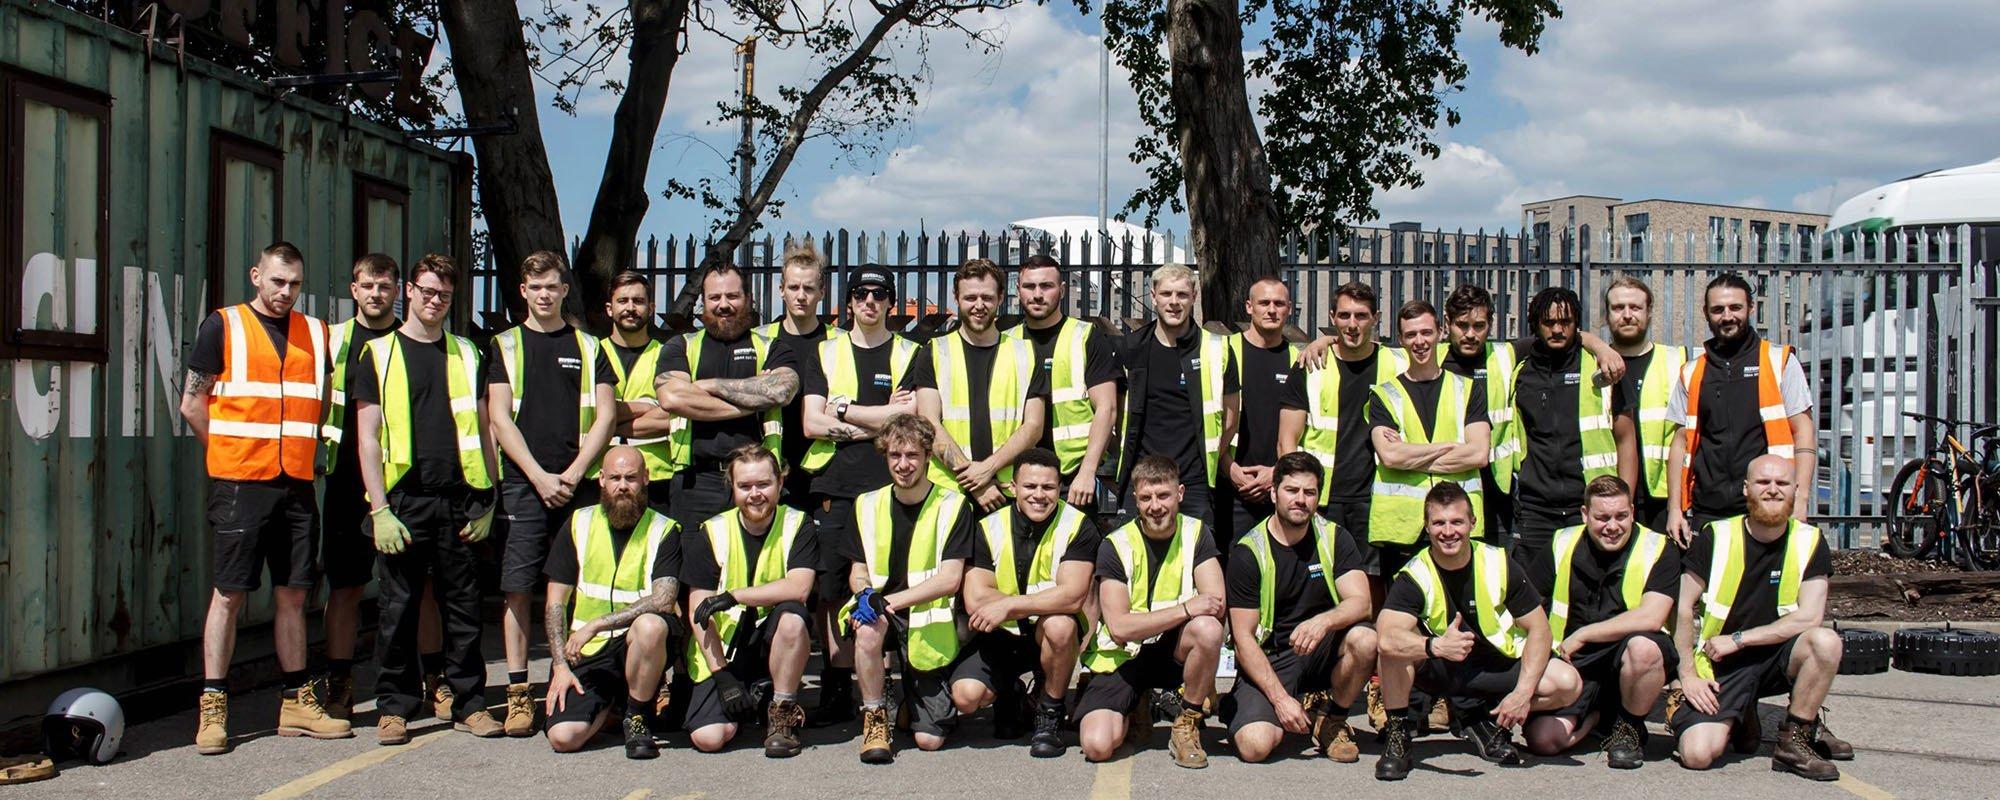 Full Silverback crew team at Victoria Warehouse